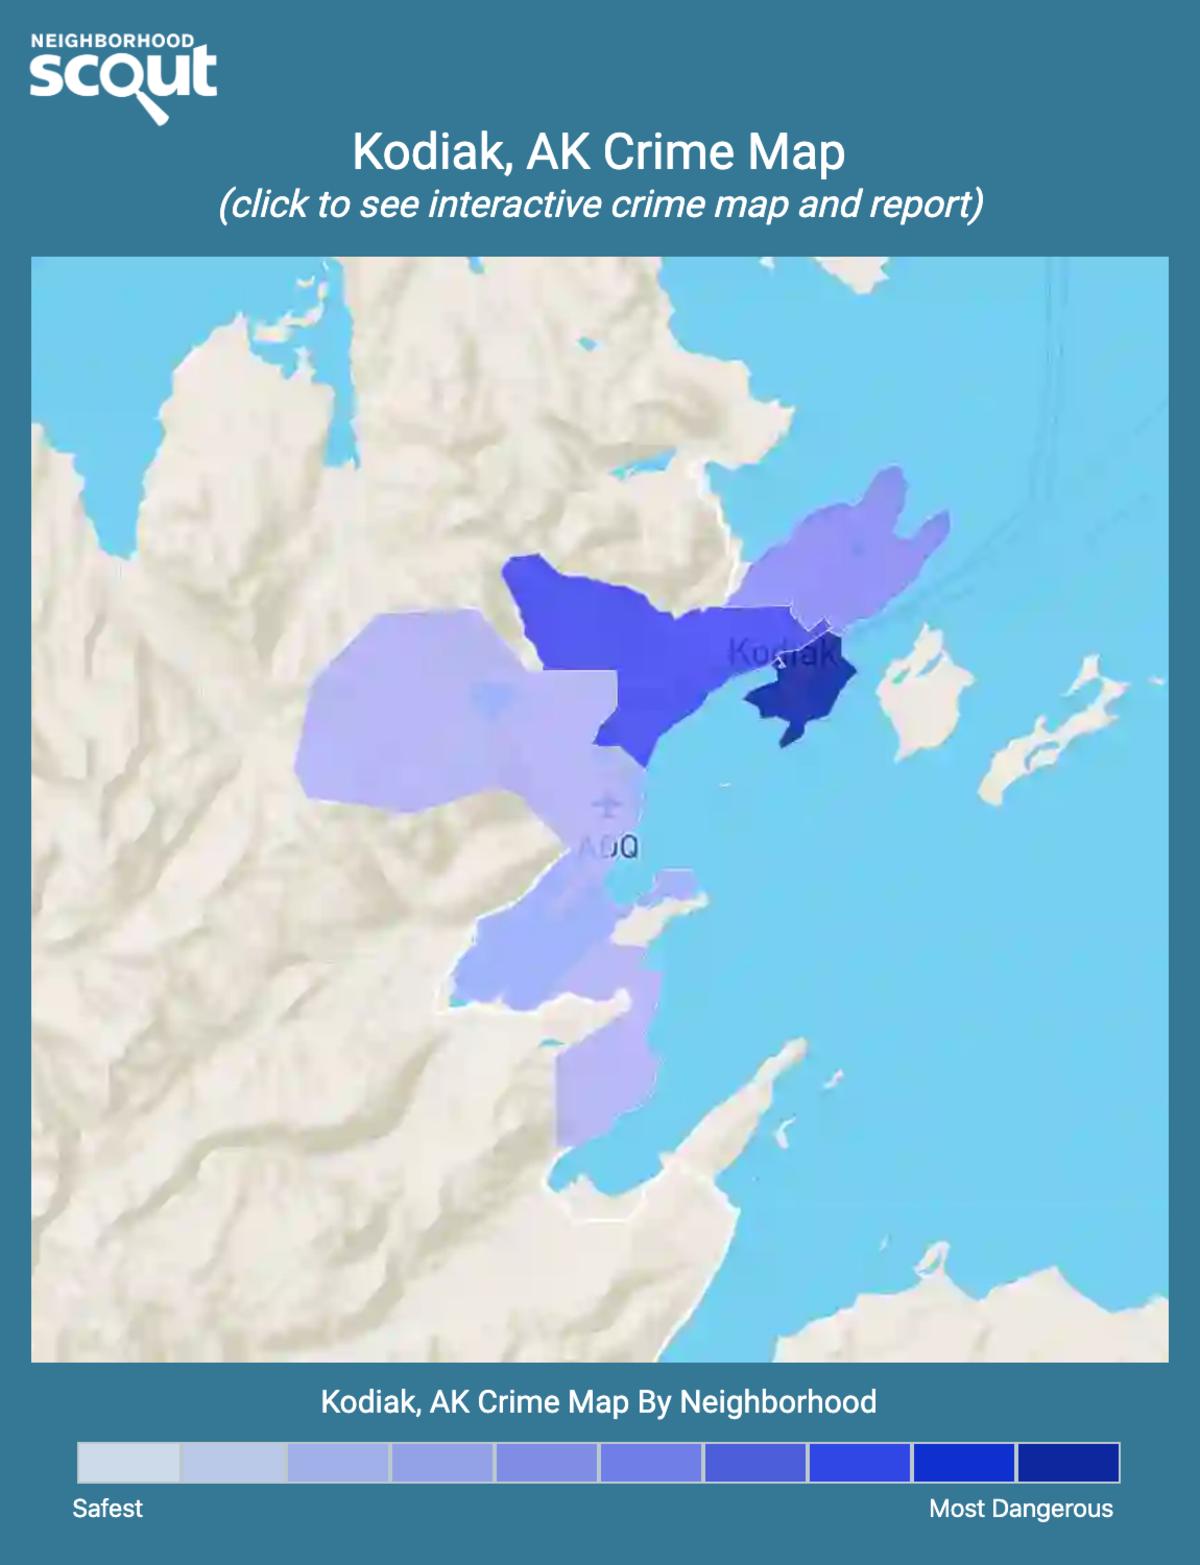 Kodiak, Alaska crime map